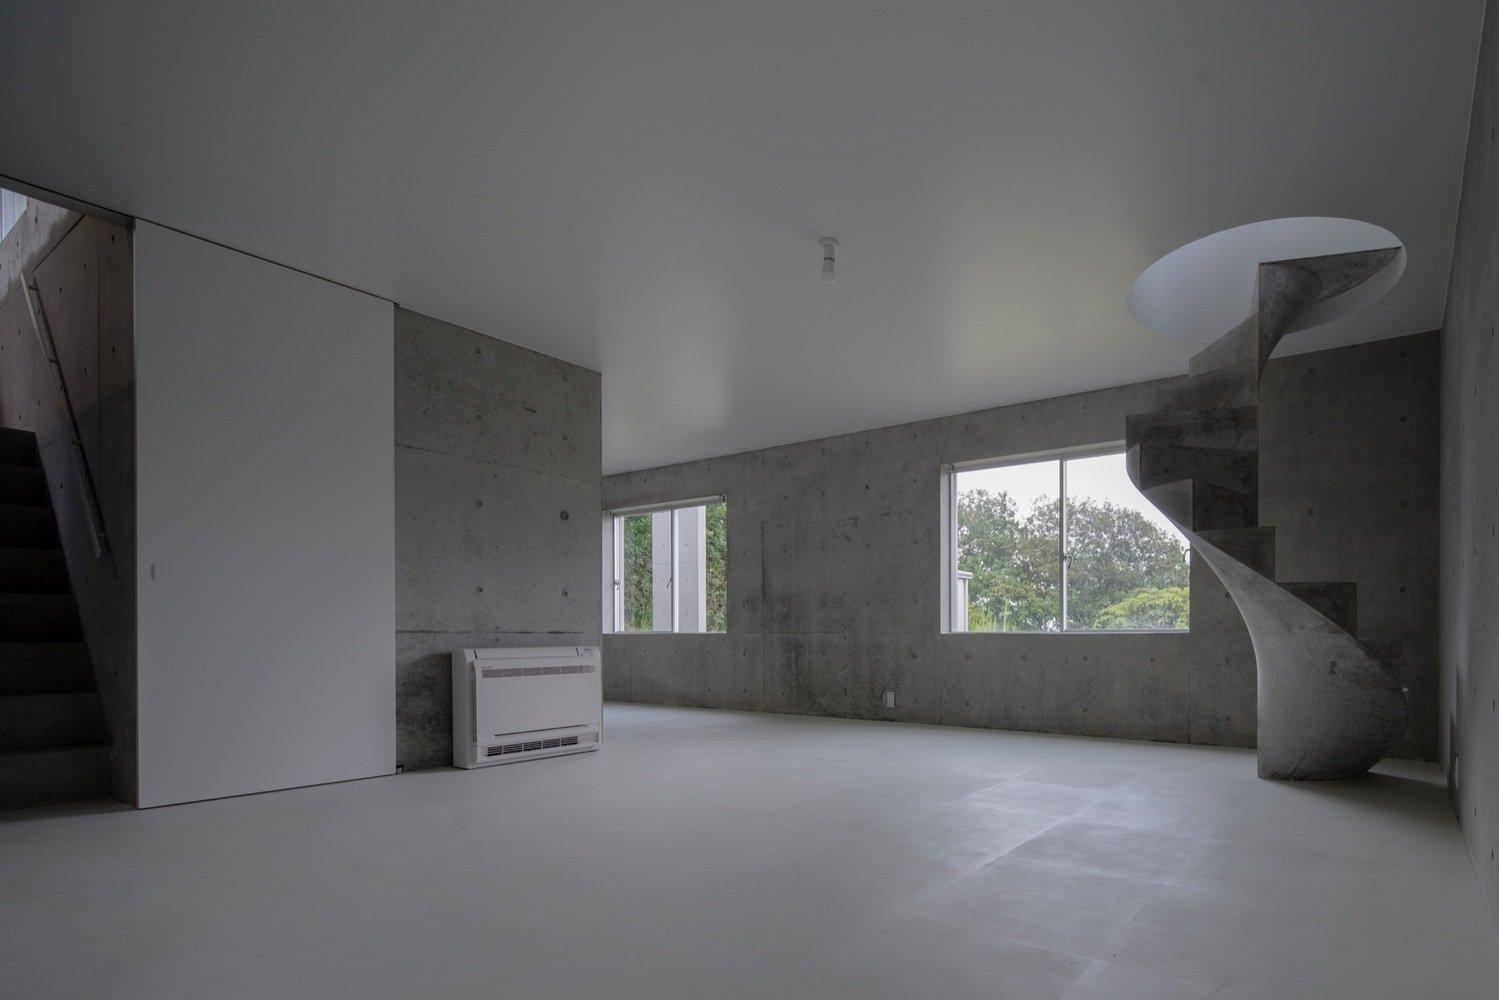 Photo 5 of 6 in House in Akitsu by Kazunori Fujimoto Architect & Associates